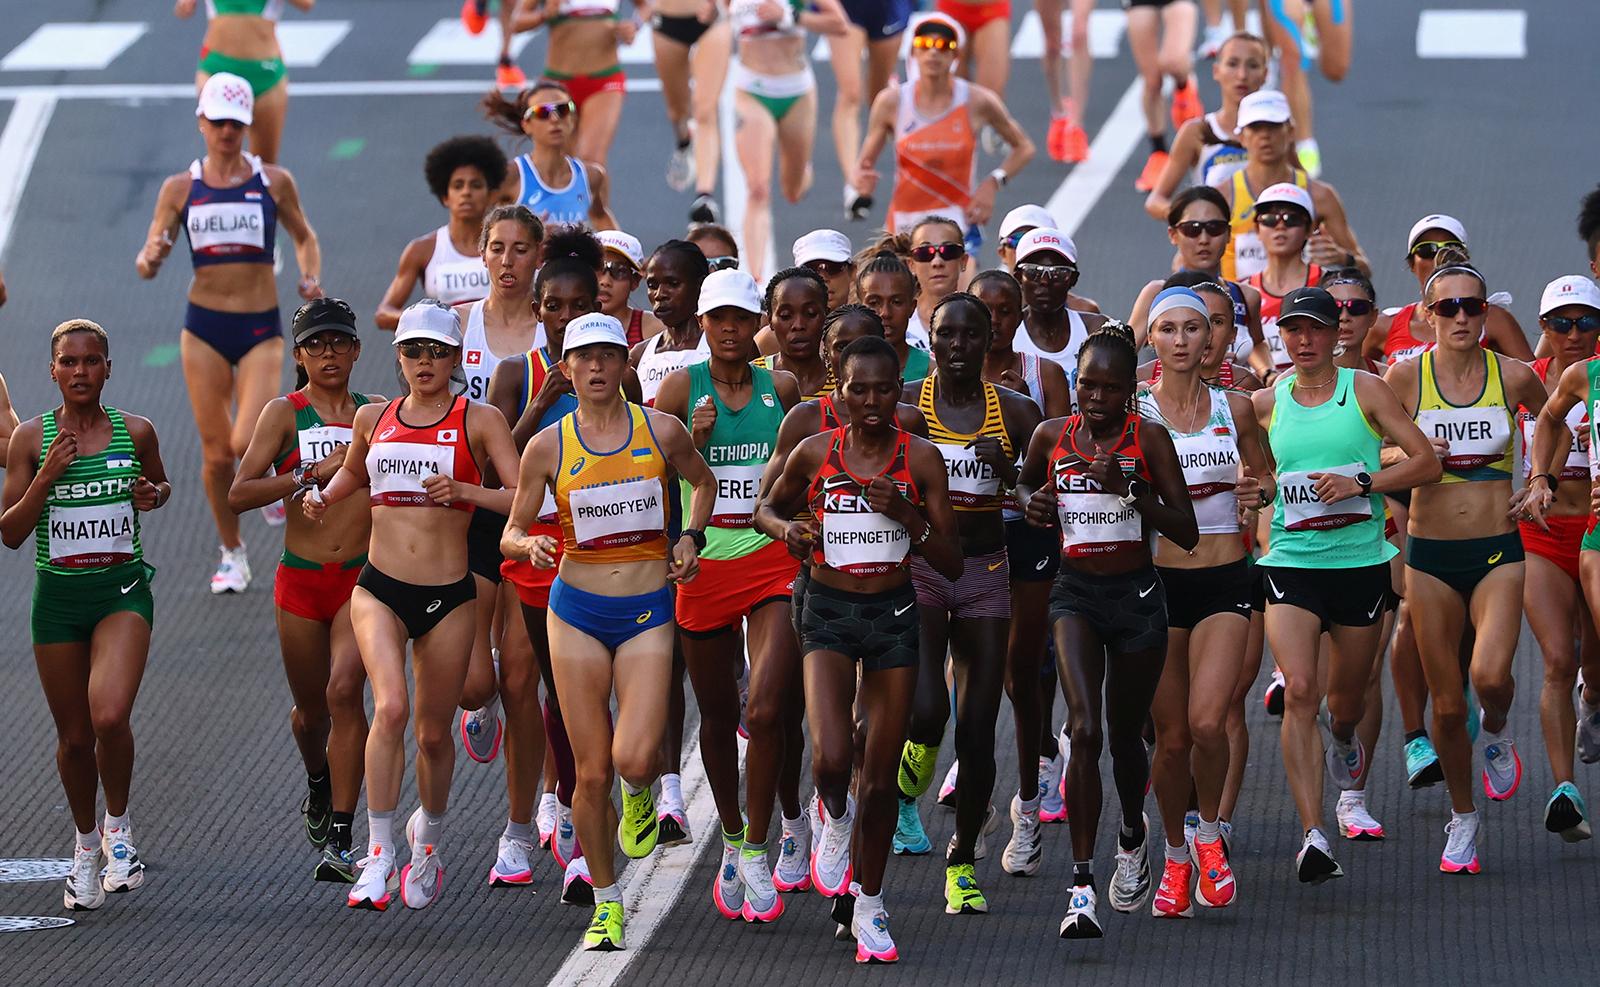 Tokyo 2020 Olympics - Athletics - Women's Marathon - Sapporo Odori Park, Sapporo, Japan - August 7, 2021. General view of athletes in action. REUTERS